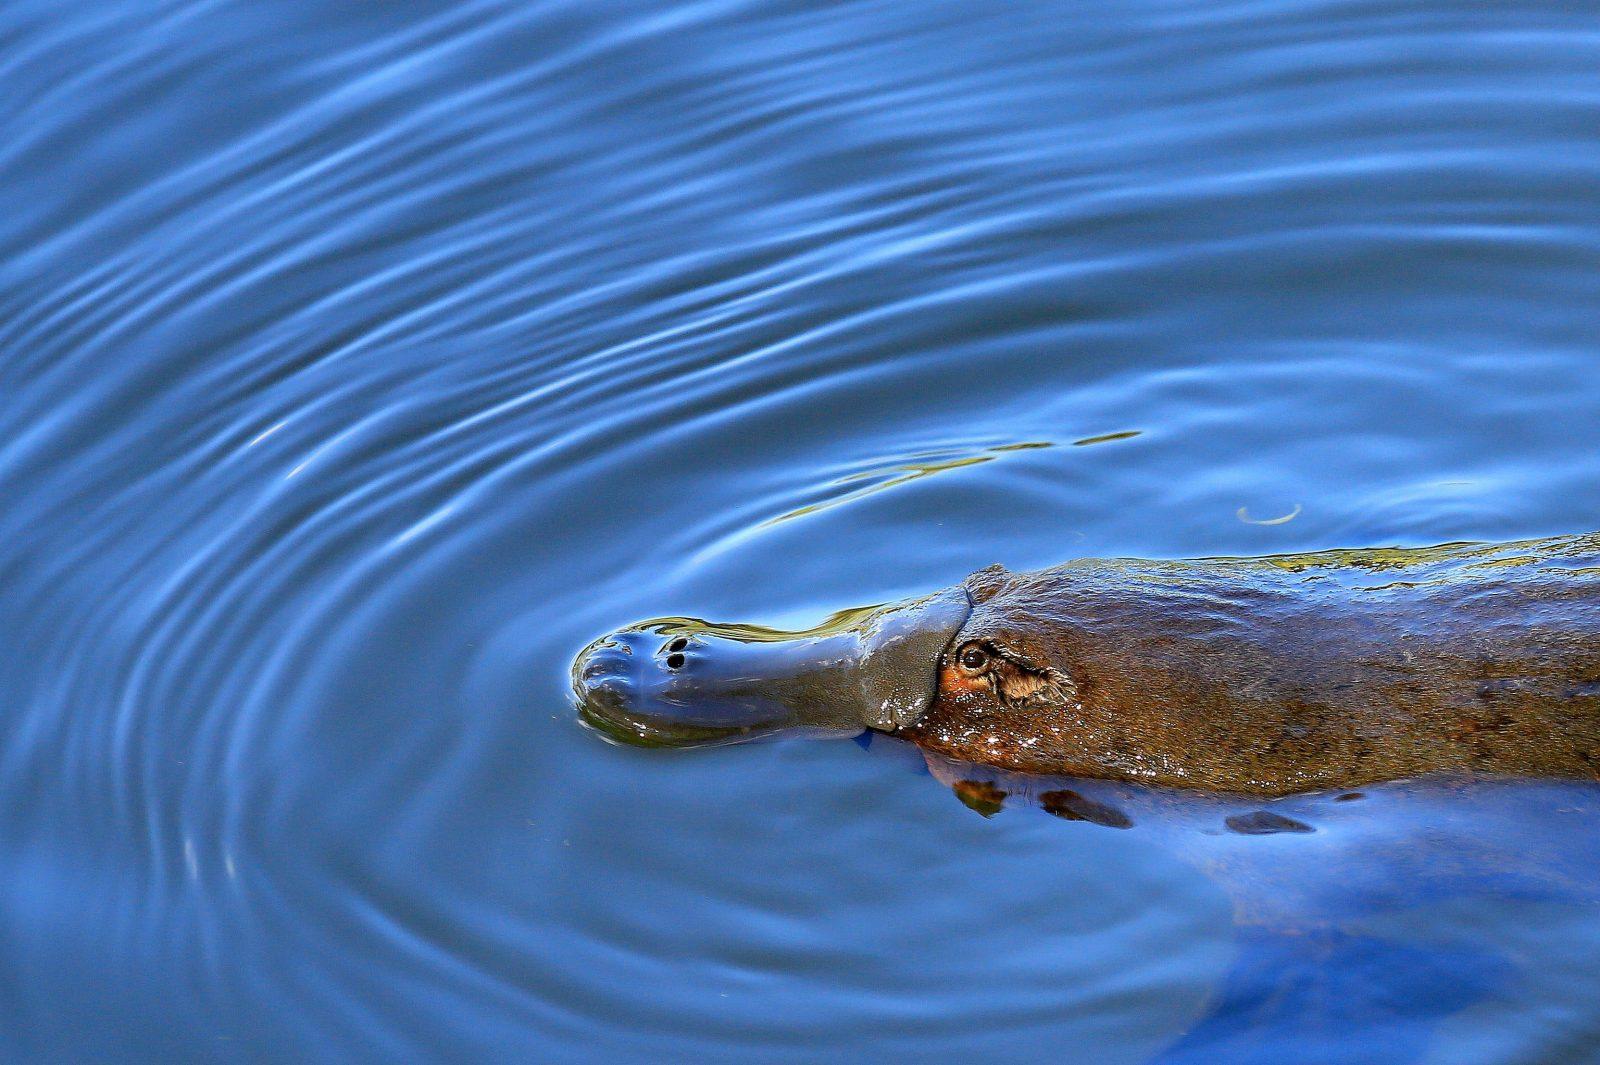 Platypus in the wild